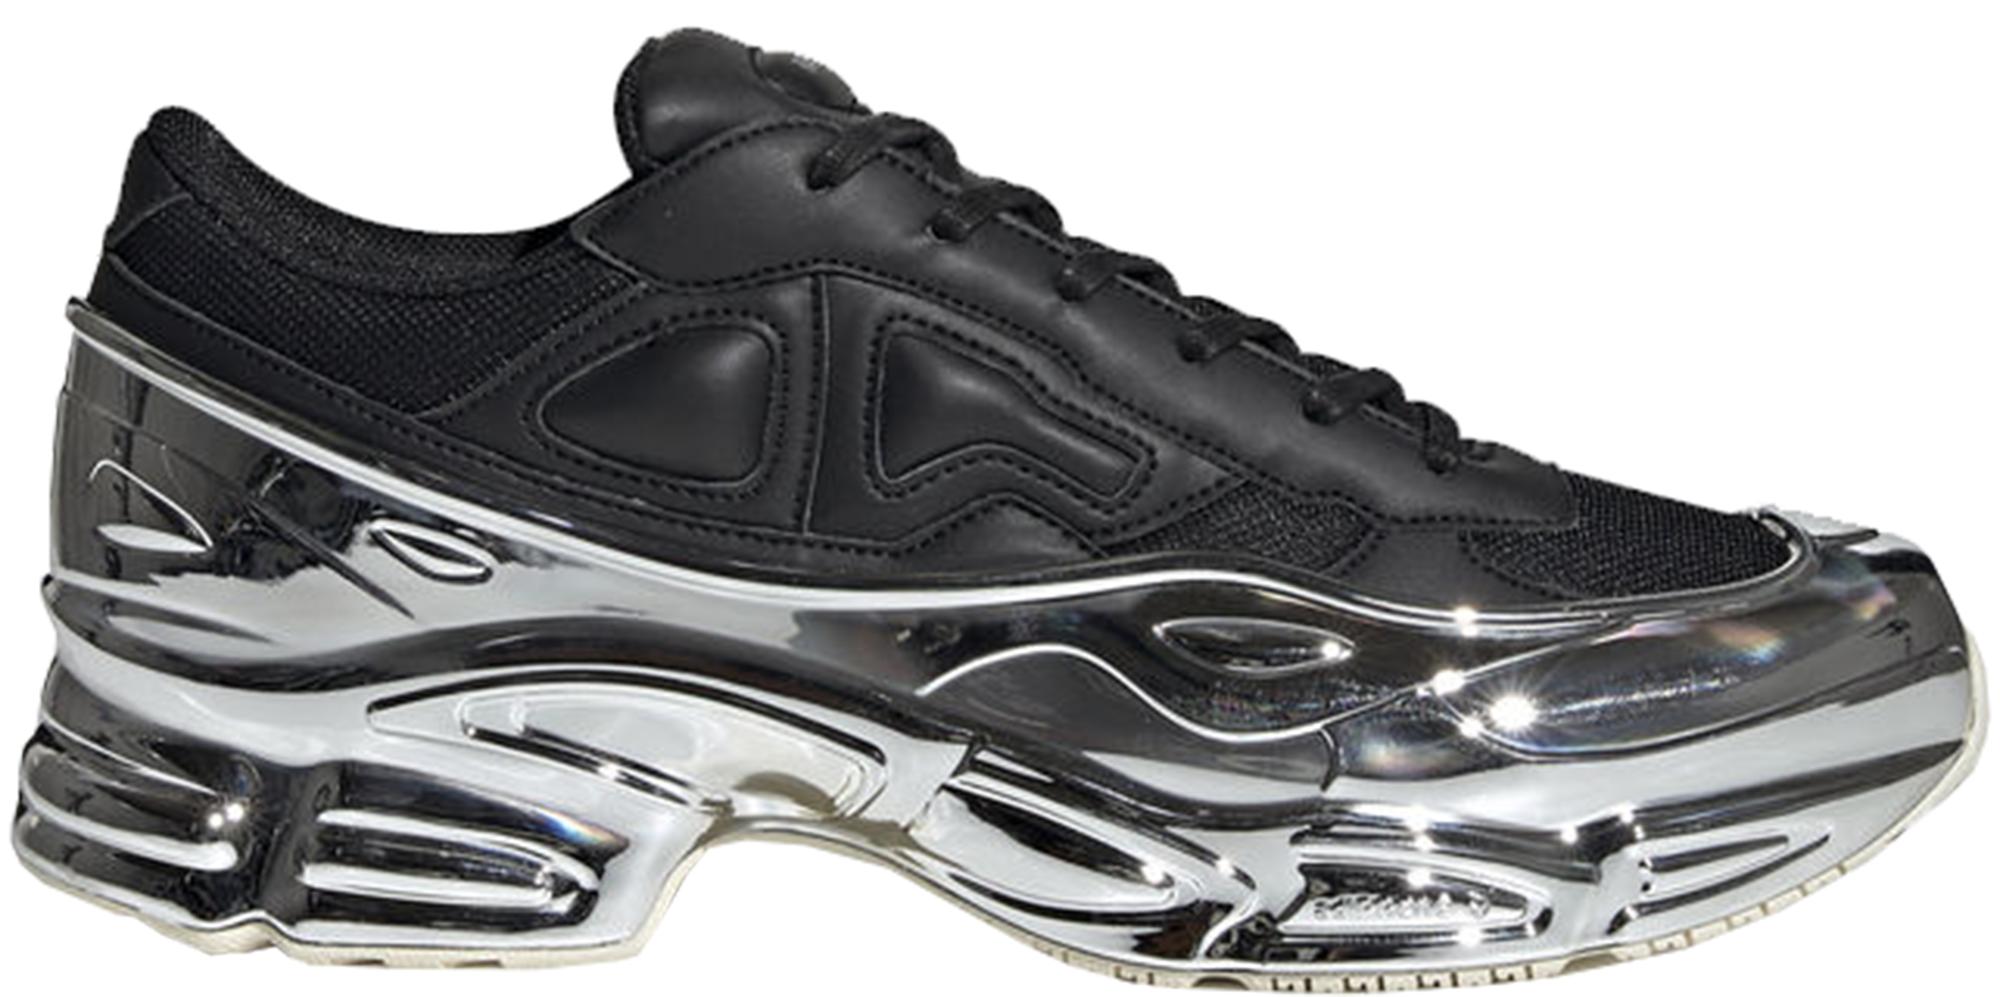 adidas Ozweego Raf Simons Core Black Silver Metallic